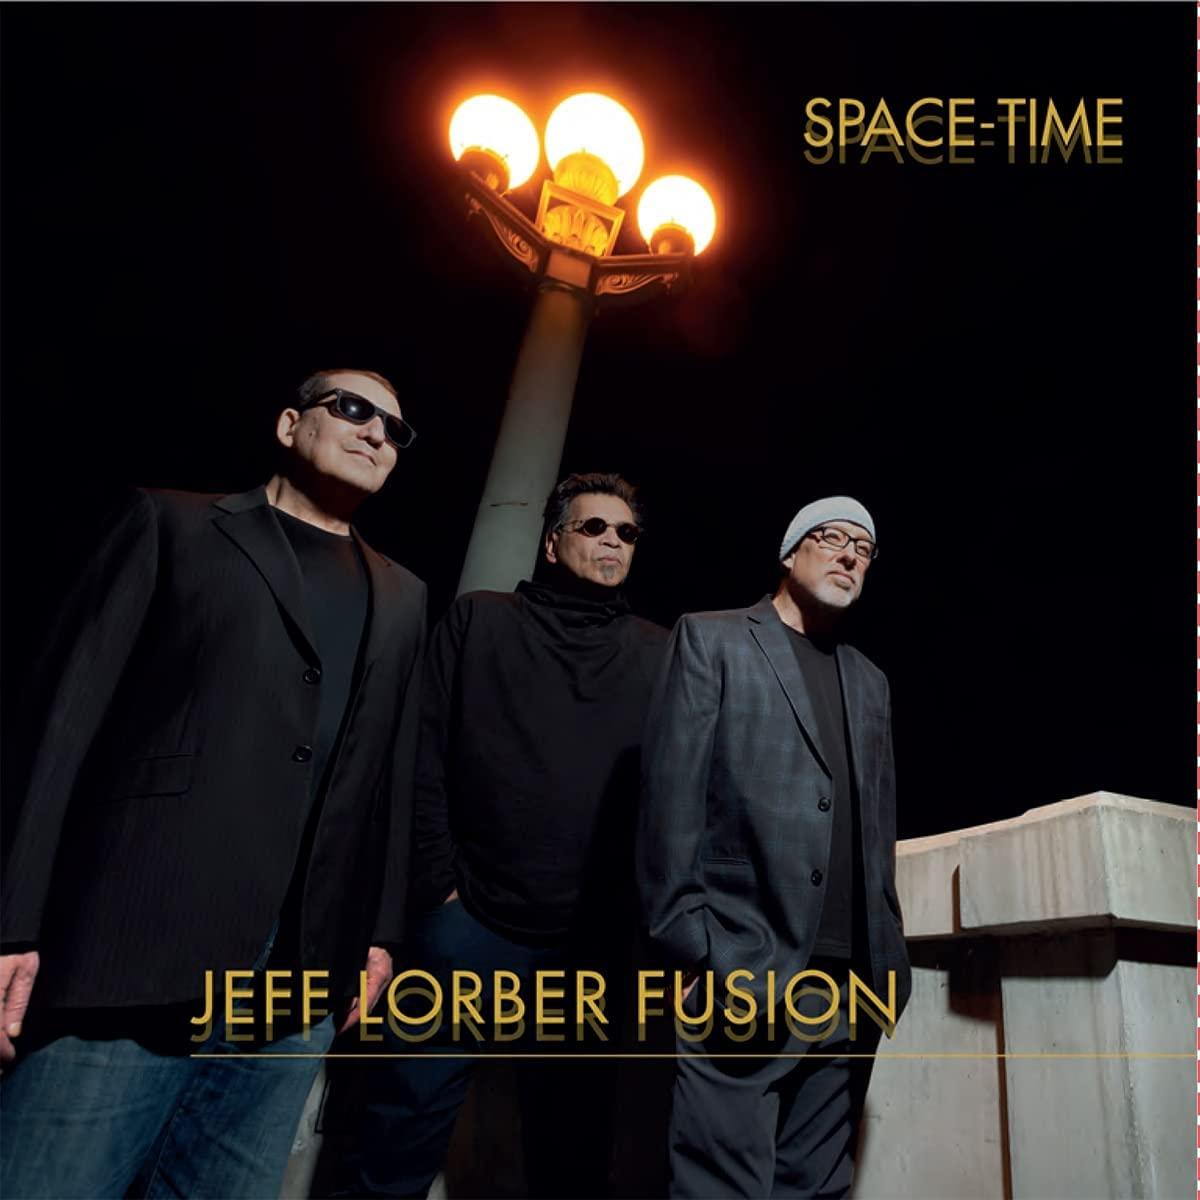 jeff lorber fusion 021